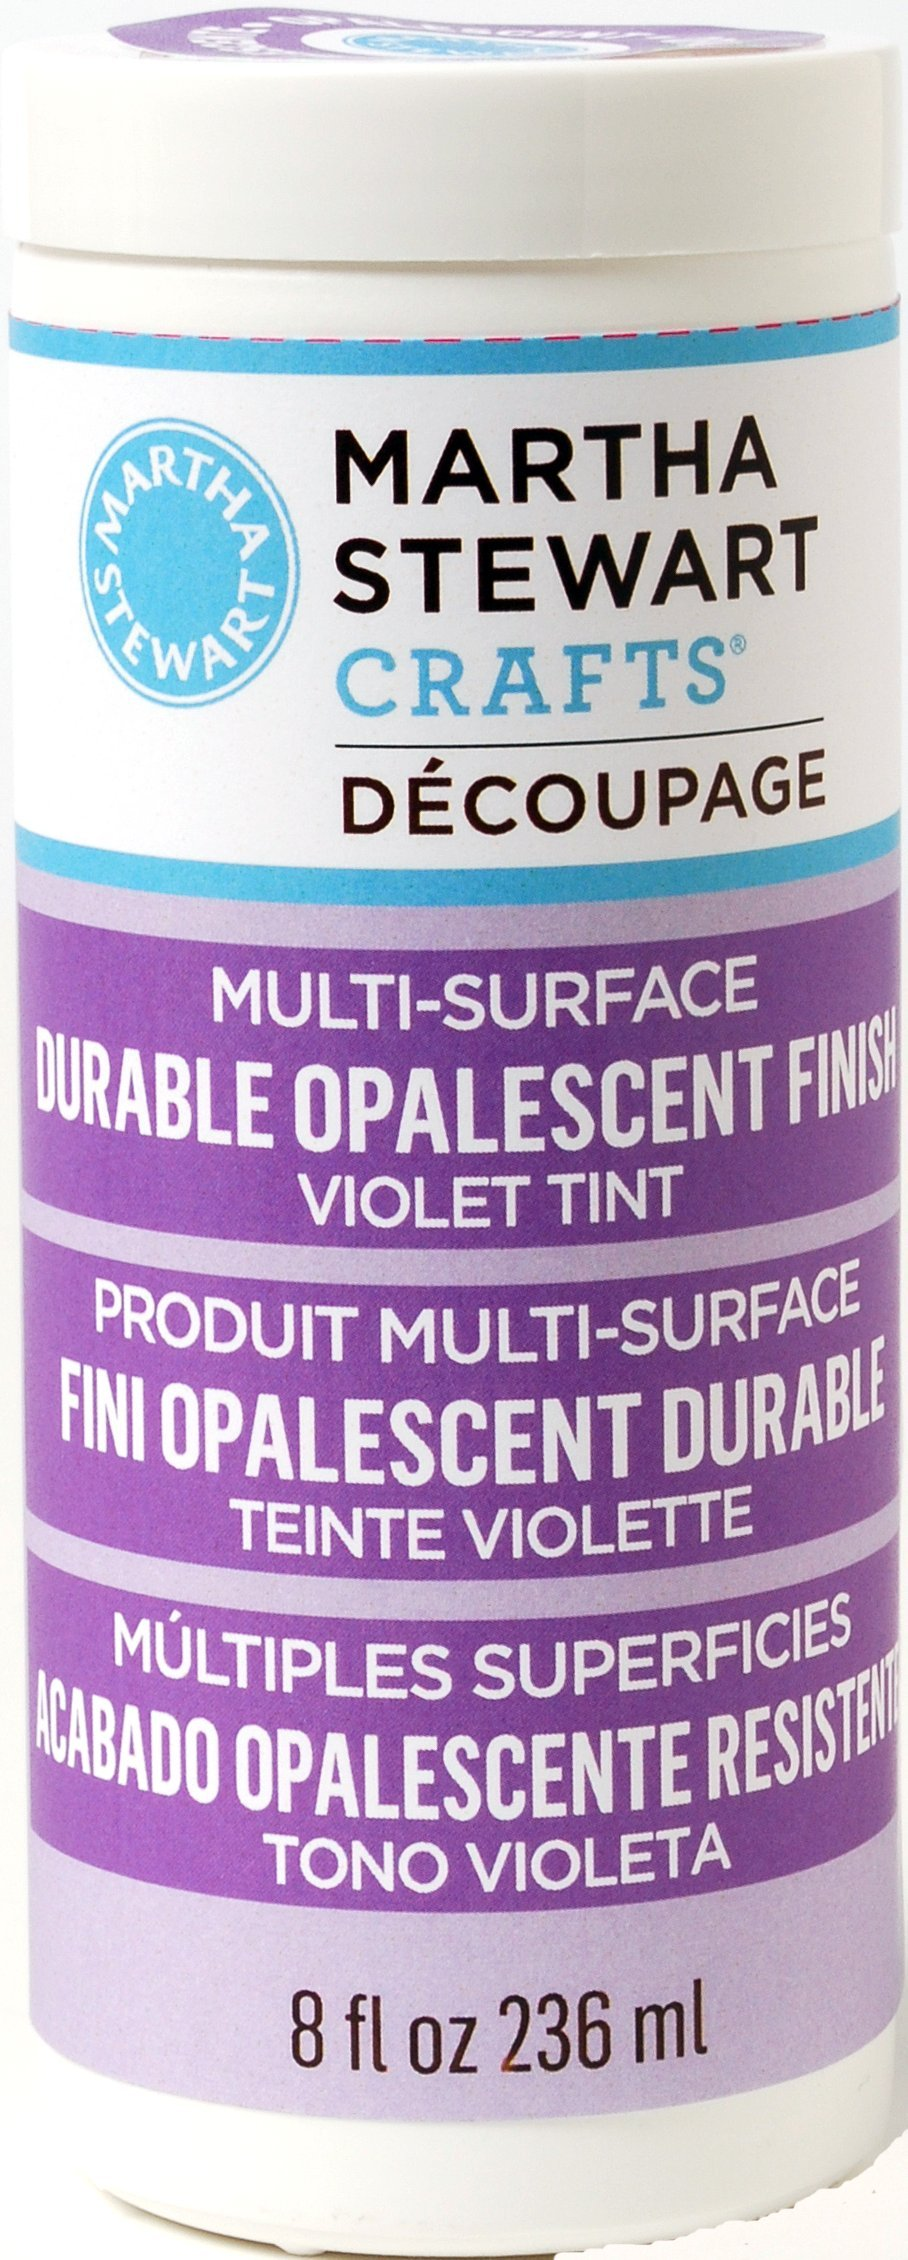 Martha Stewart Crafts Decoupage Formula (8-Ounce), 33286 Opalescent Violet Finish